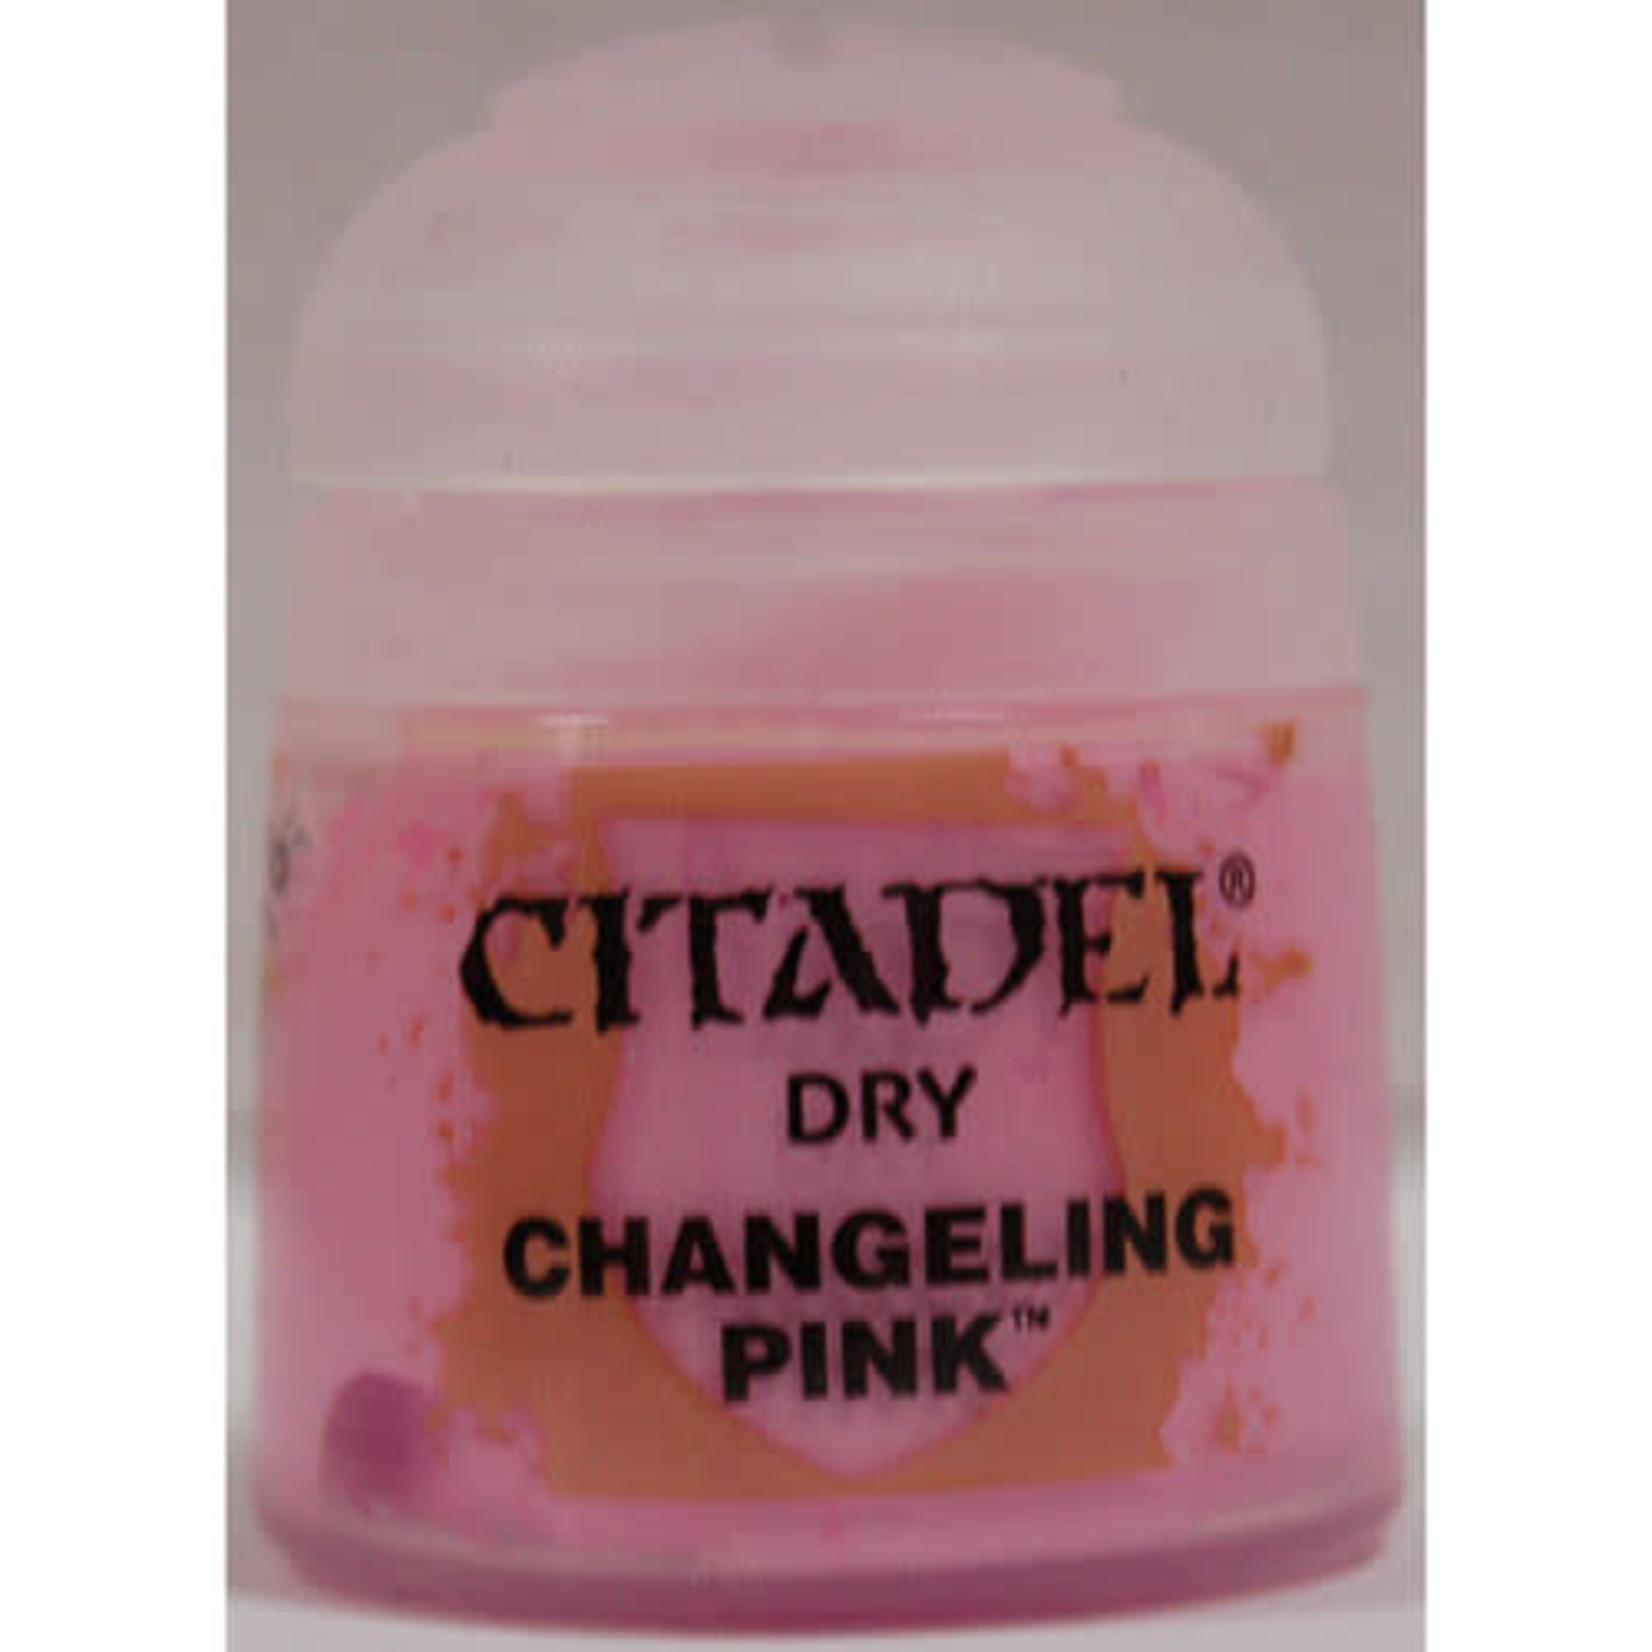 Citadel Citadel Paint - Dry: Changeling Pink